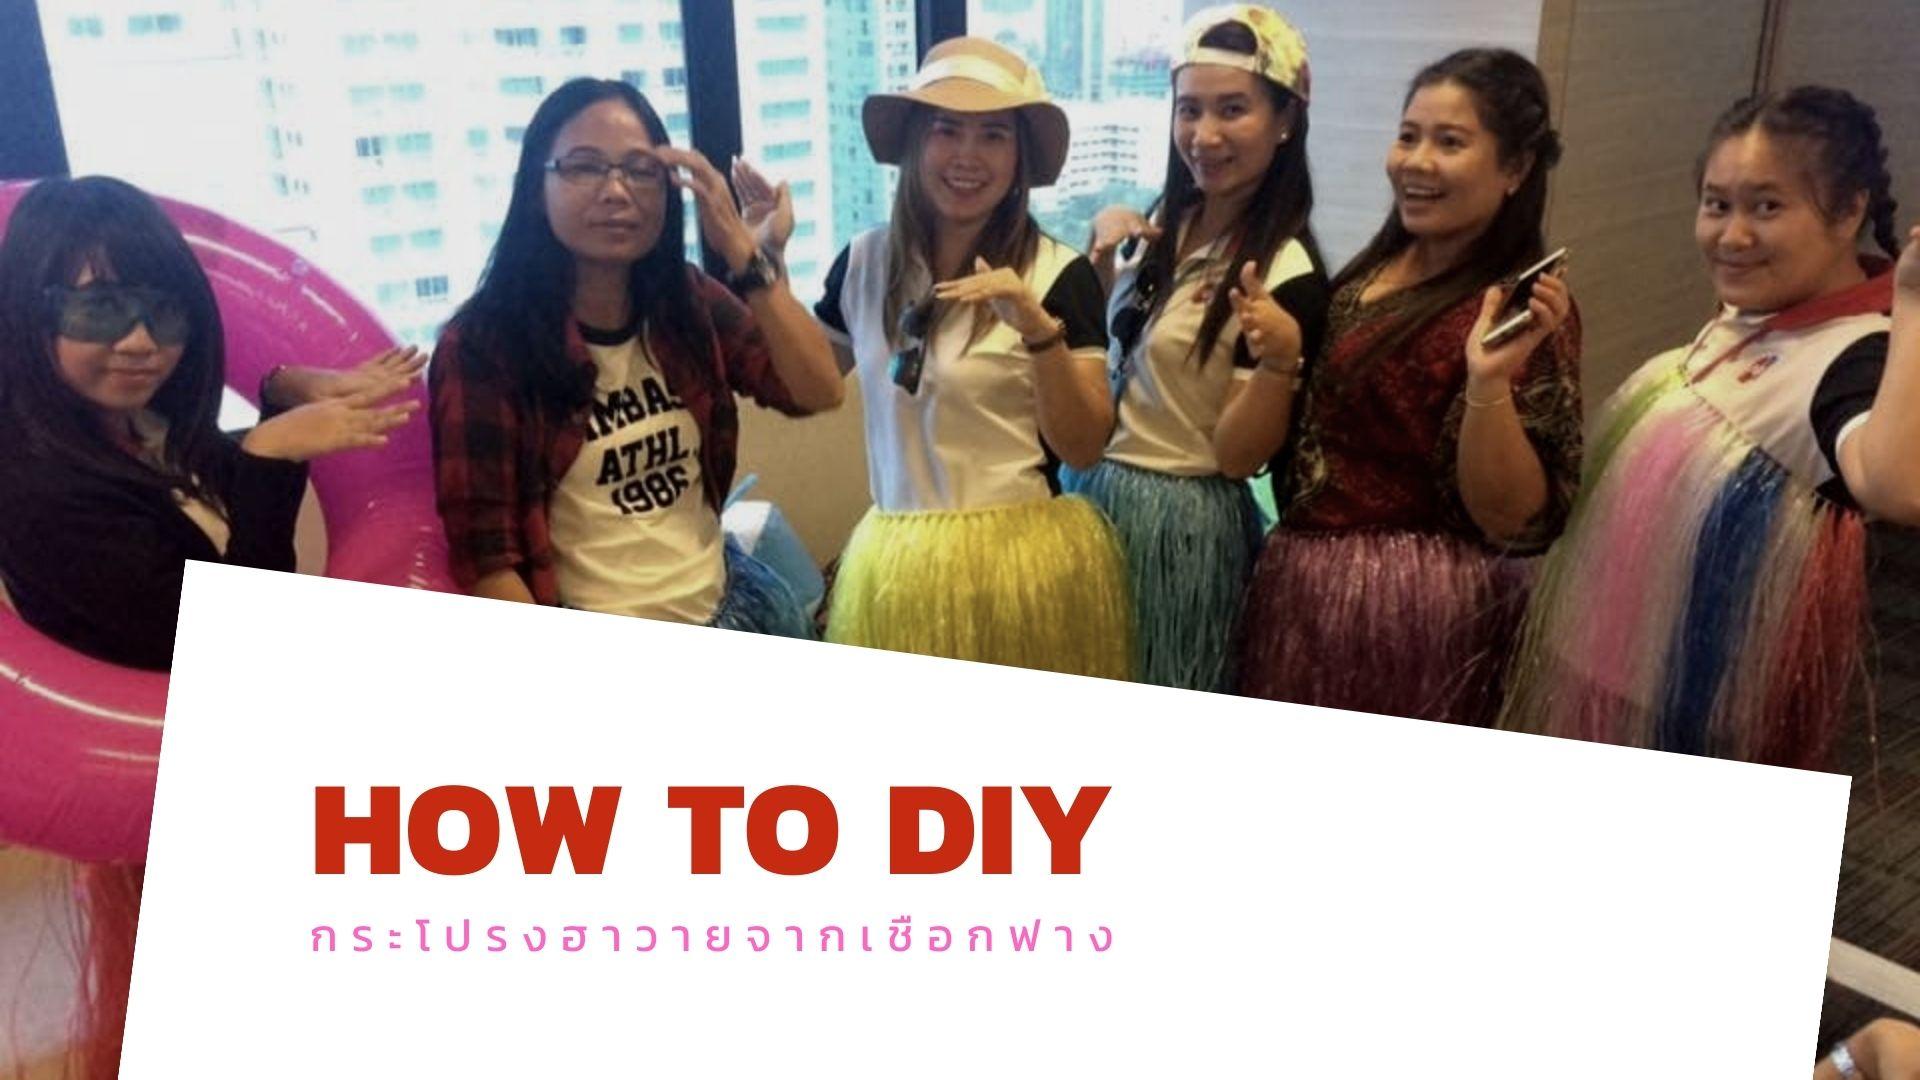 How to DIY กระโปรงฮาวายจากเชือกฟาง